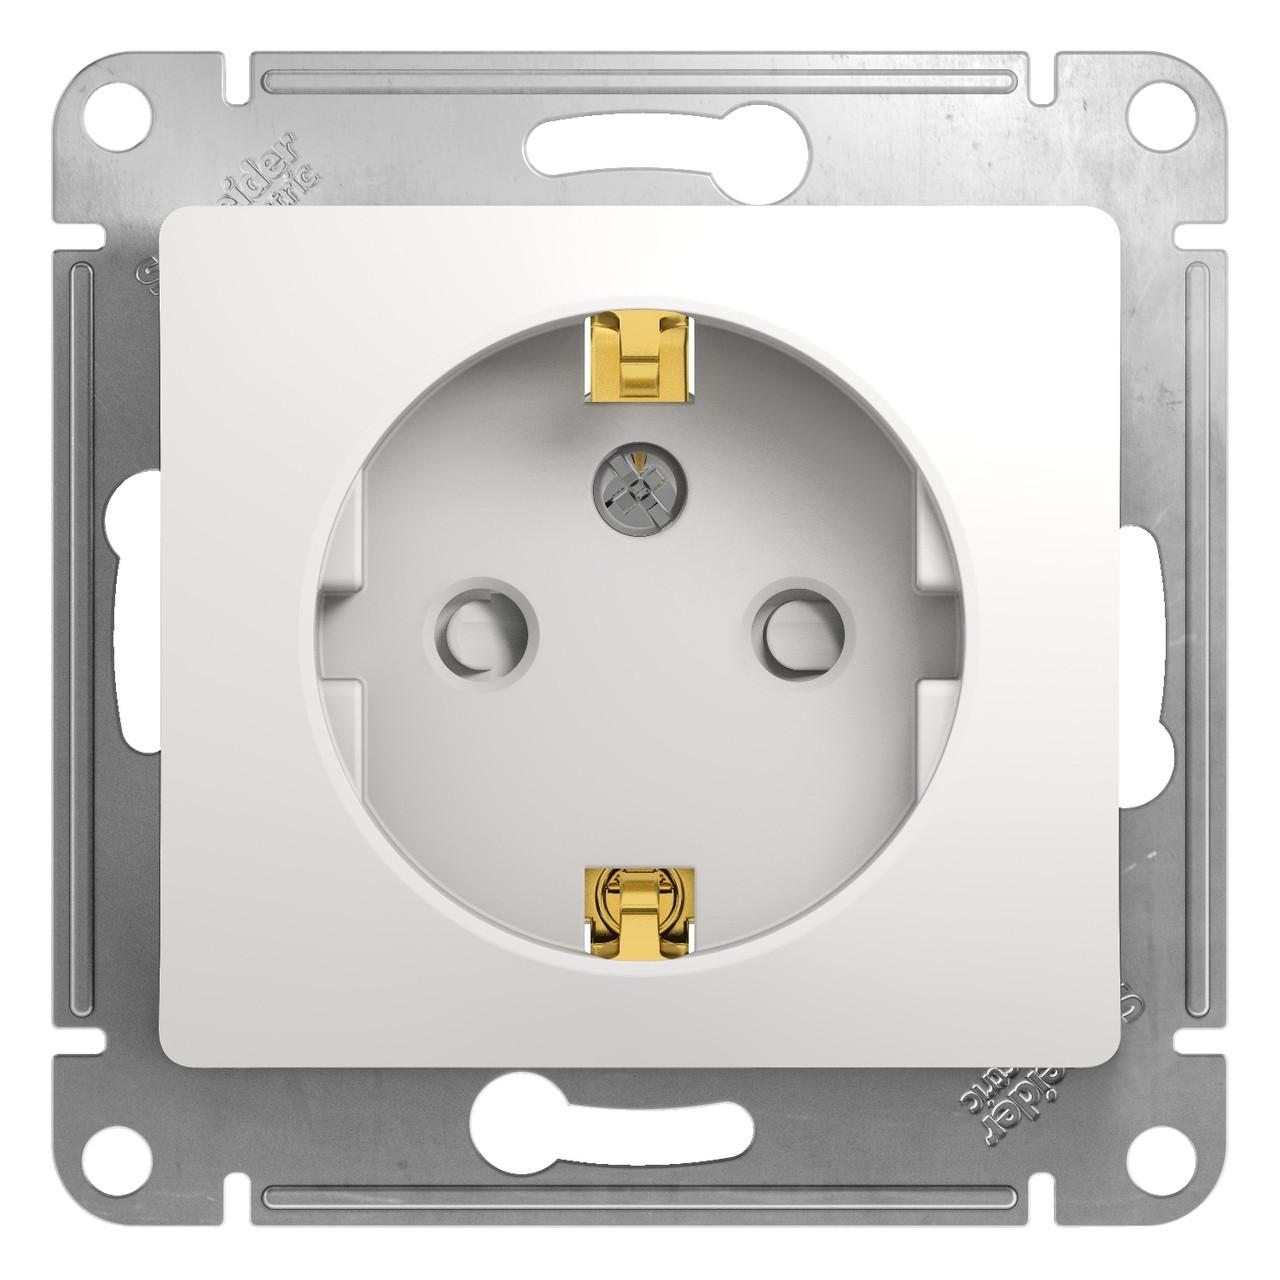 GSL000145 Glossa - одна розетка - бок.вых.заземл - 2P + E со шторками - 16 A - белый